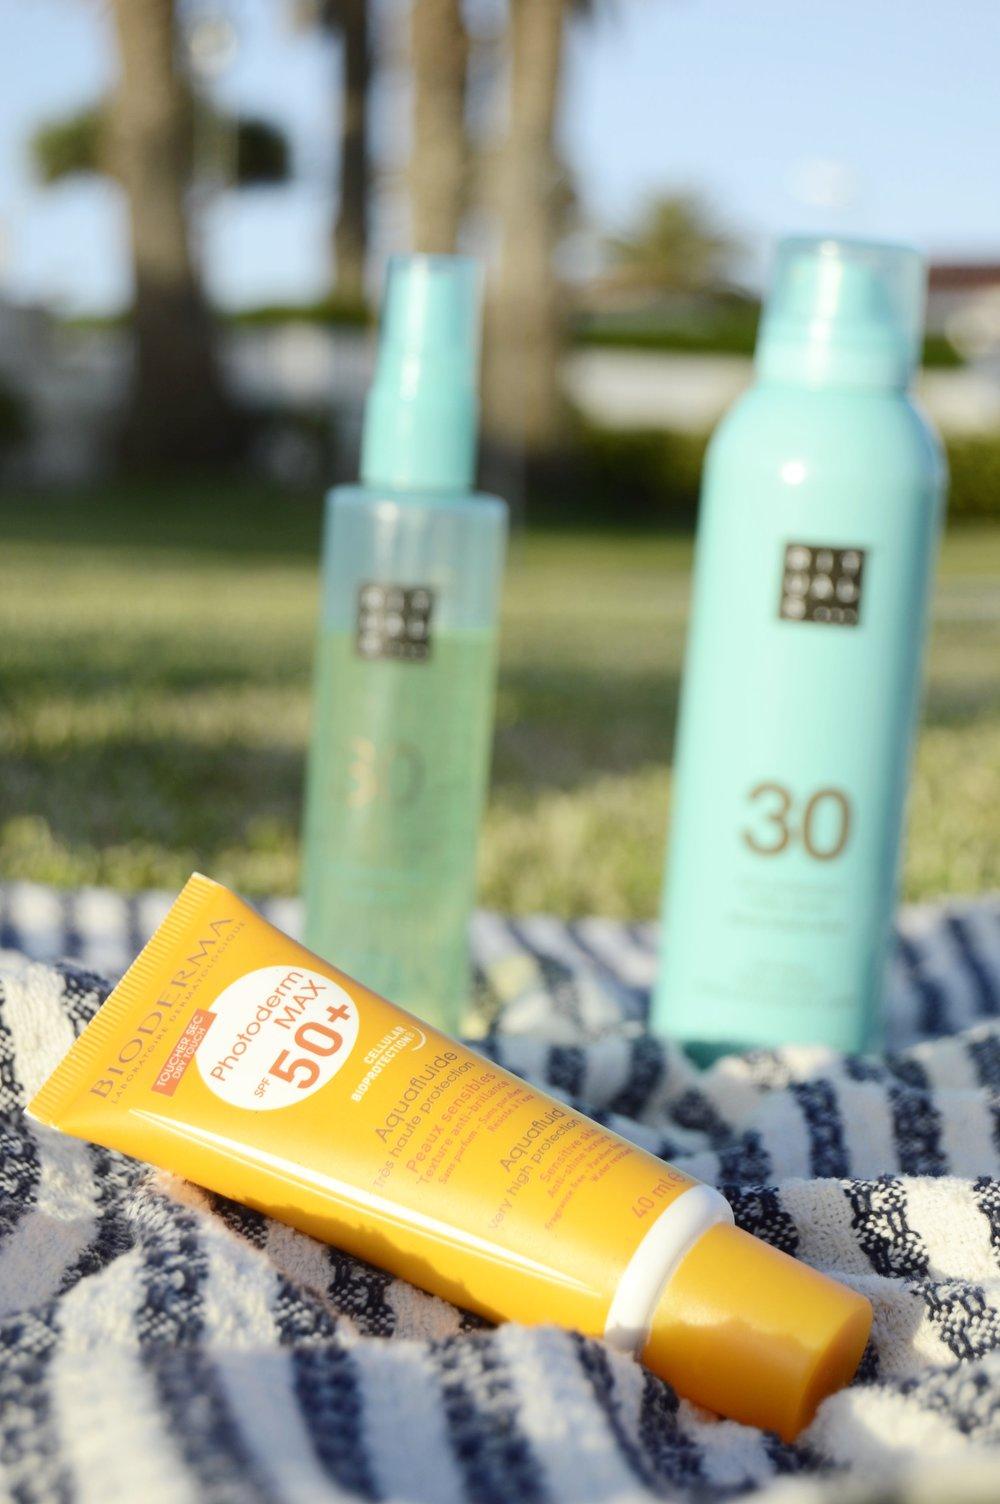 Blog-Urlaub-Beauty-Review-Empfehlung